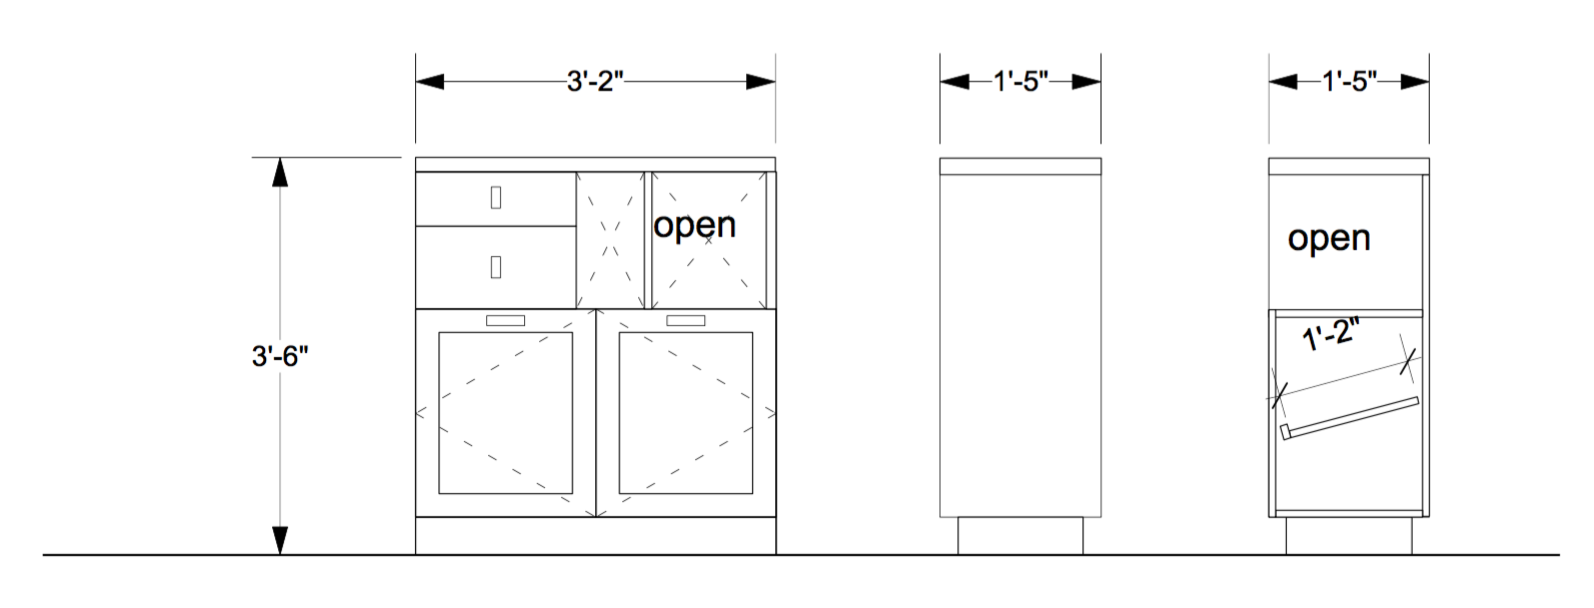 Walnut-Handmade-Entry-Console-Furniture-Dimensions-JMorris-Design